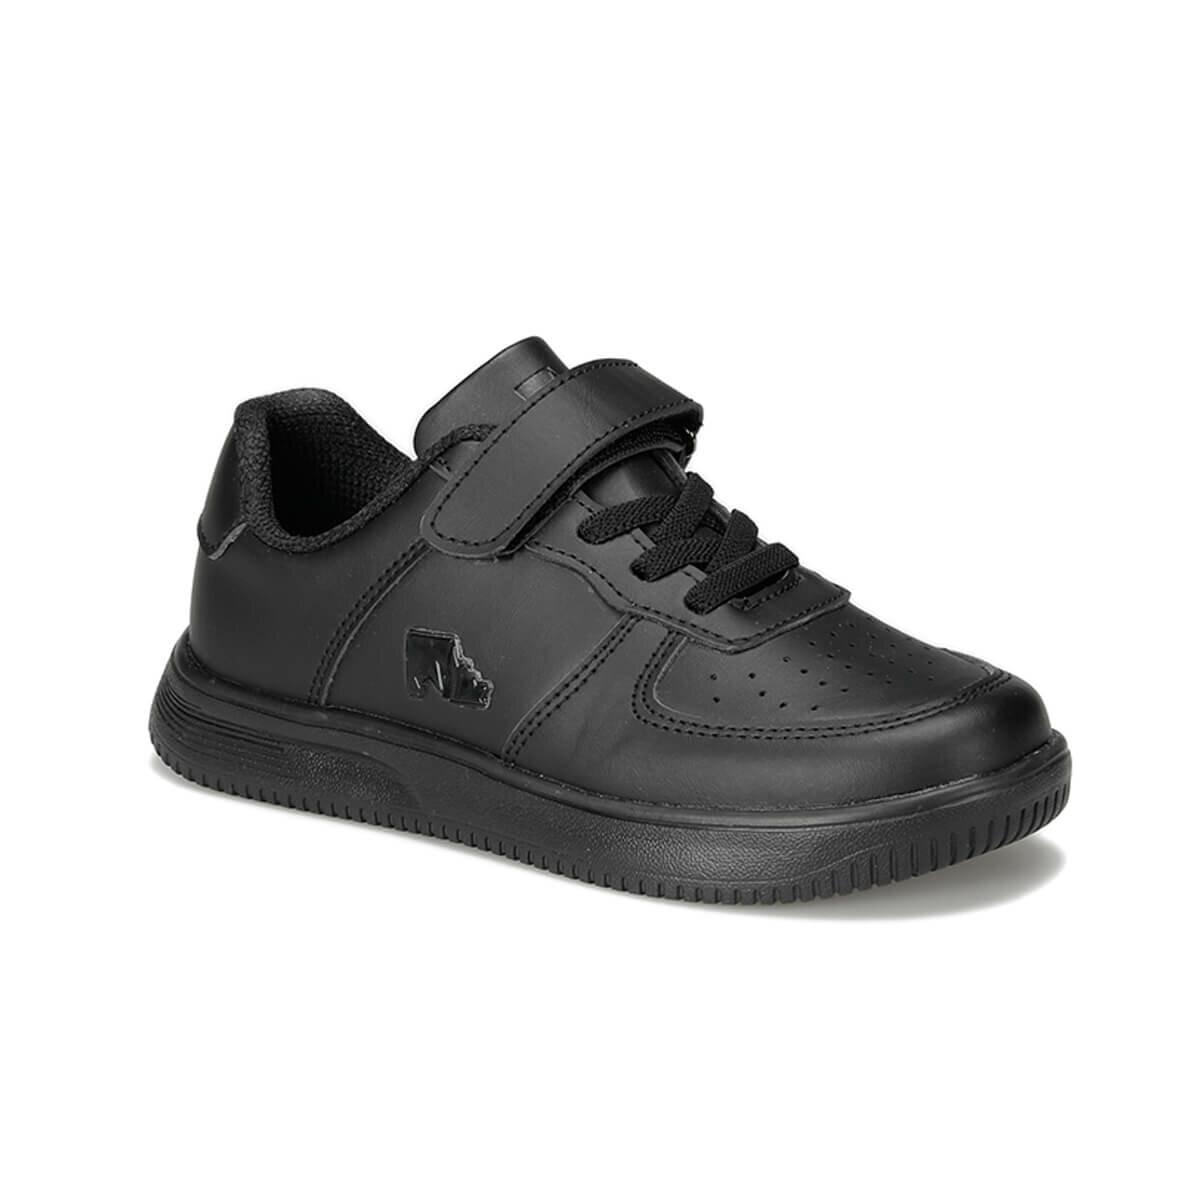 FLO FINSTER JR 9PR Black Male Child Sneaker Shoes LUMBERJACK